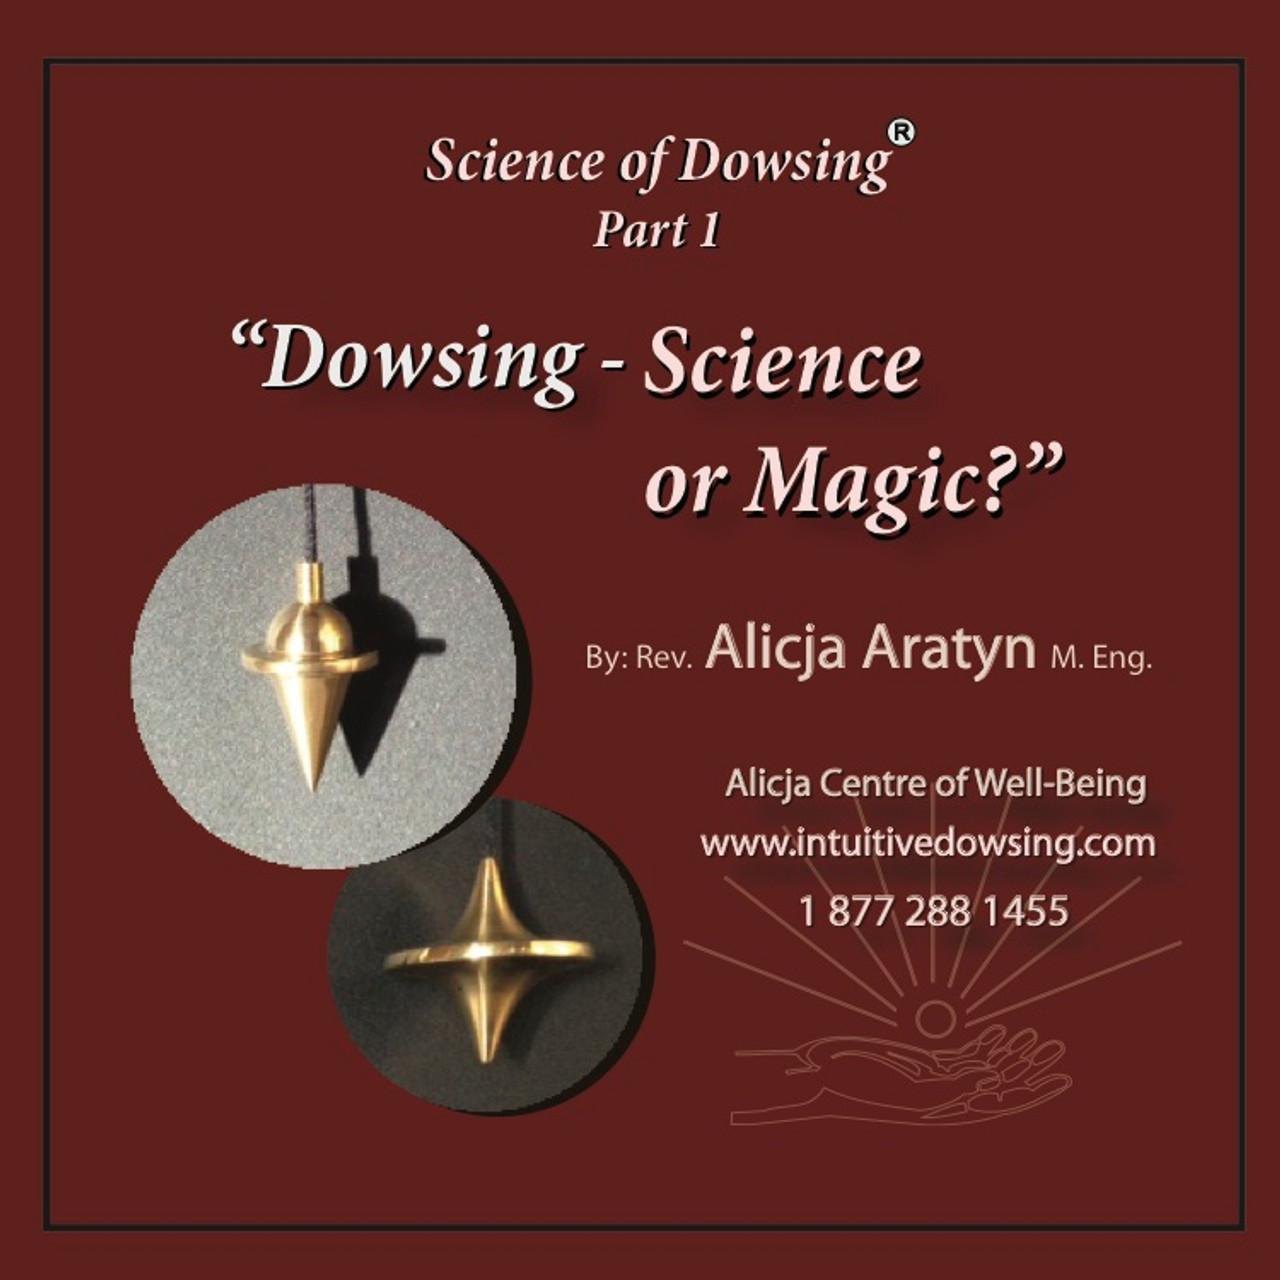 Dowsing – Science or Magic?